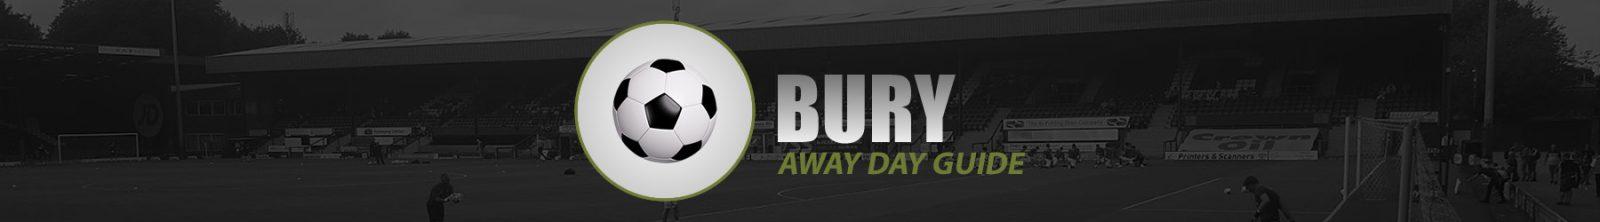 Bury Away